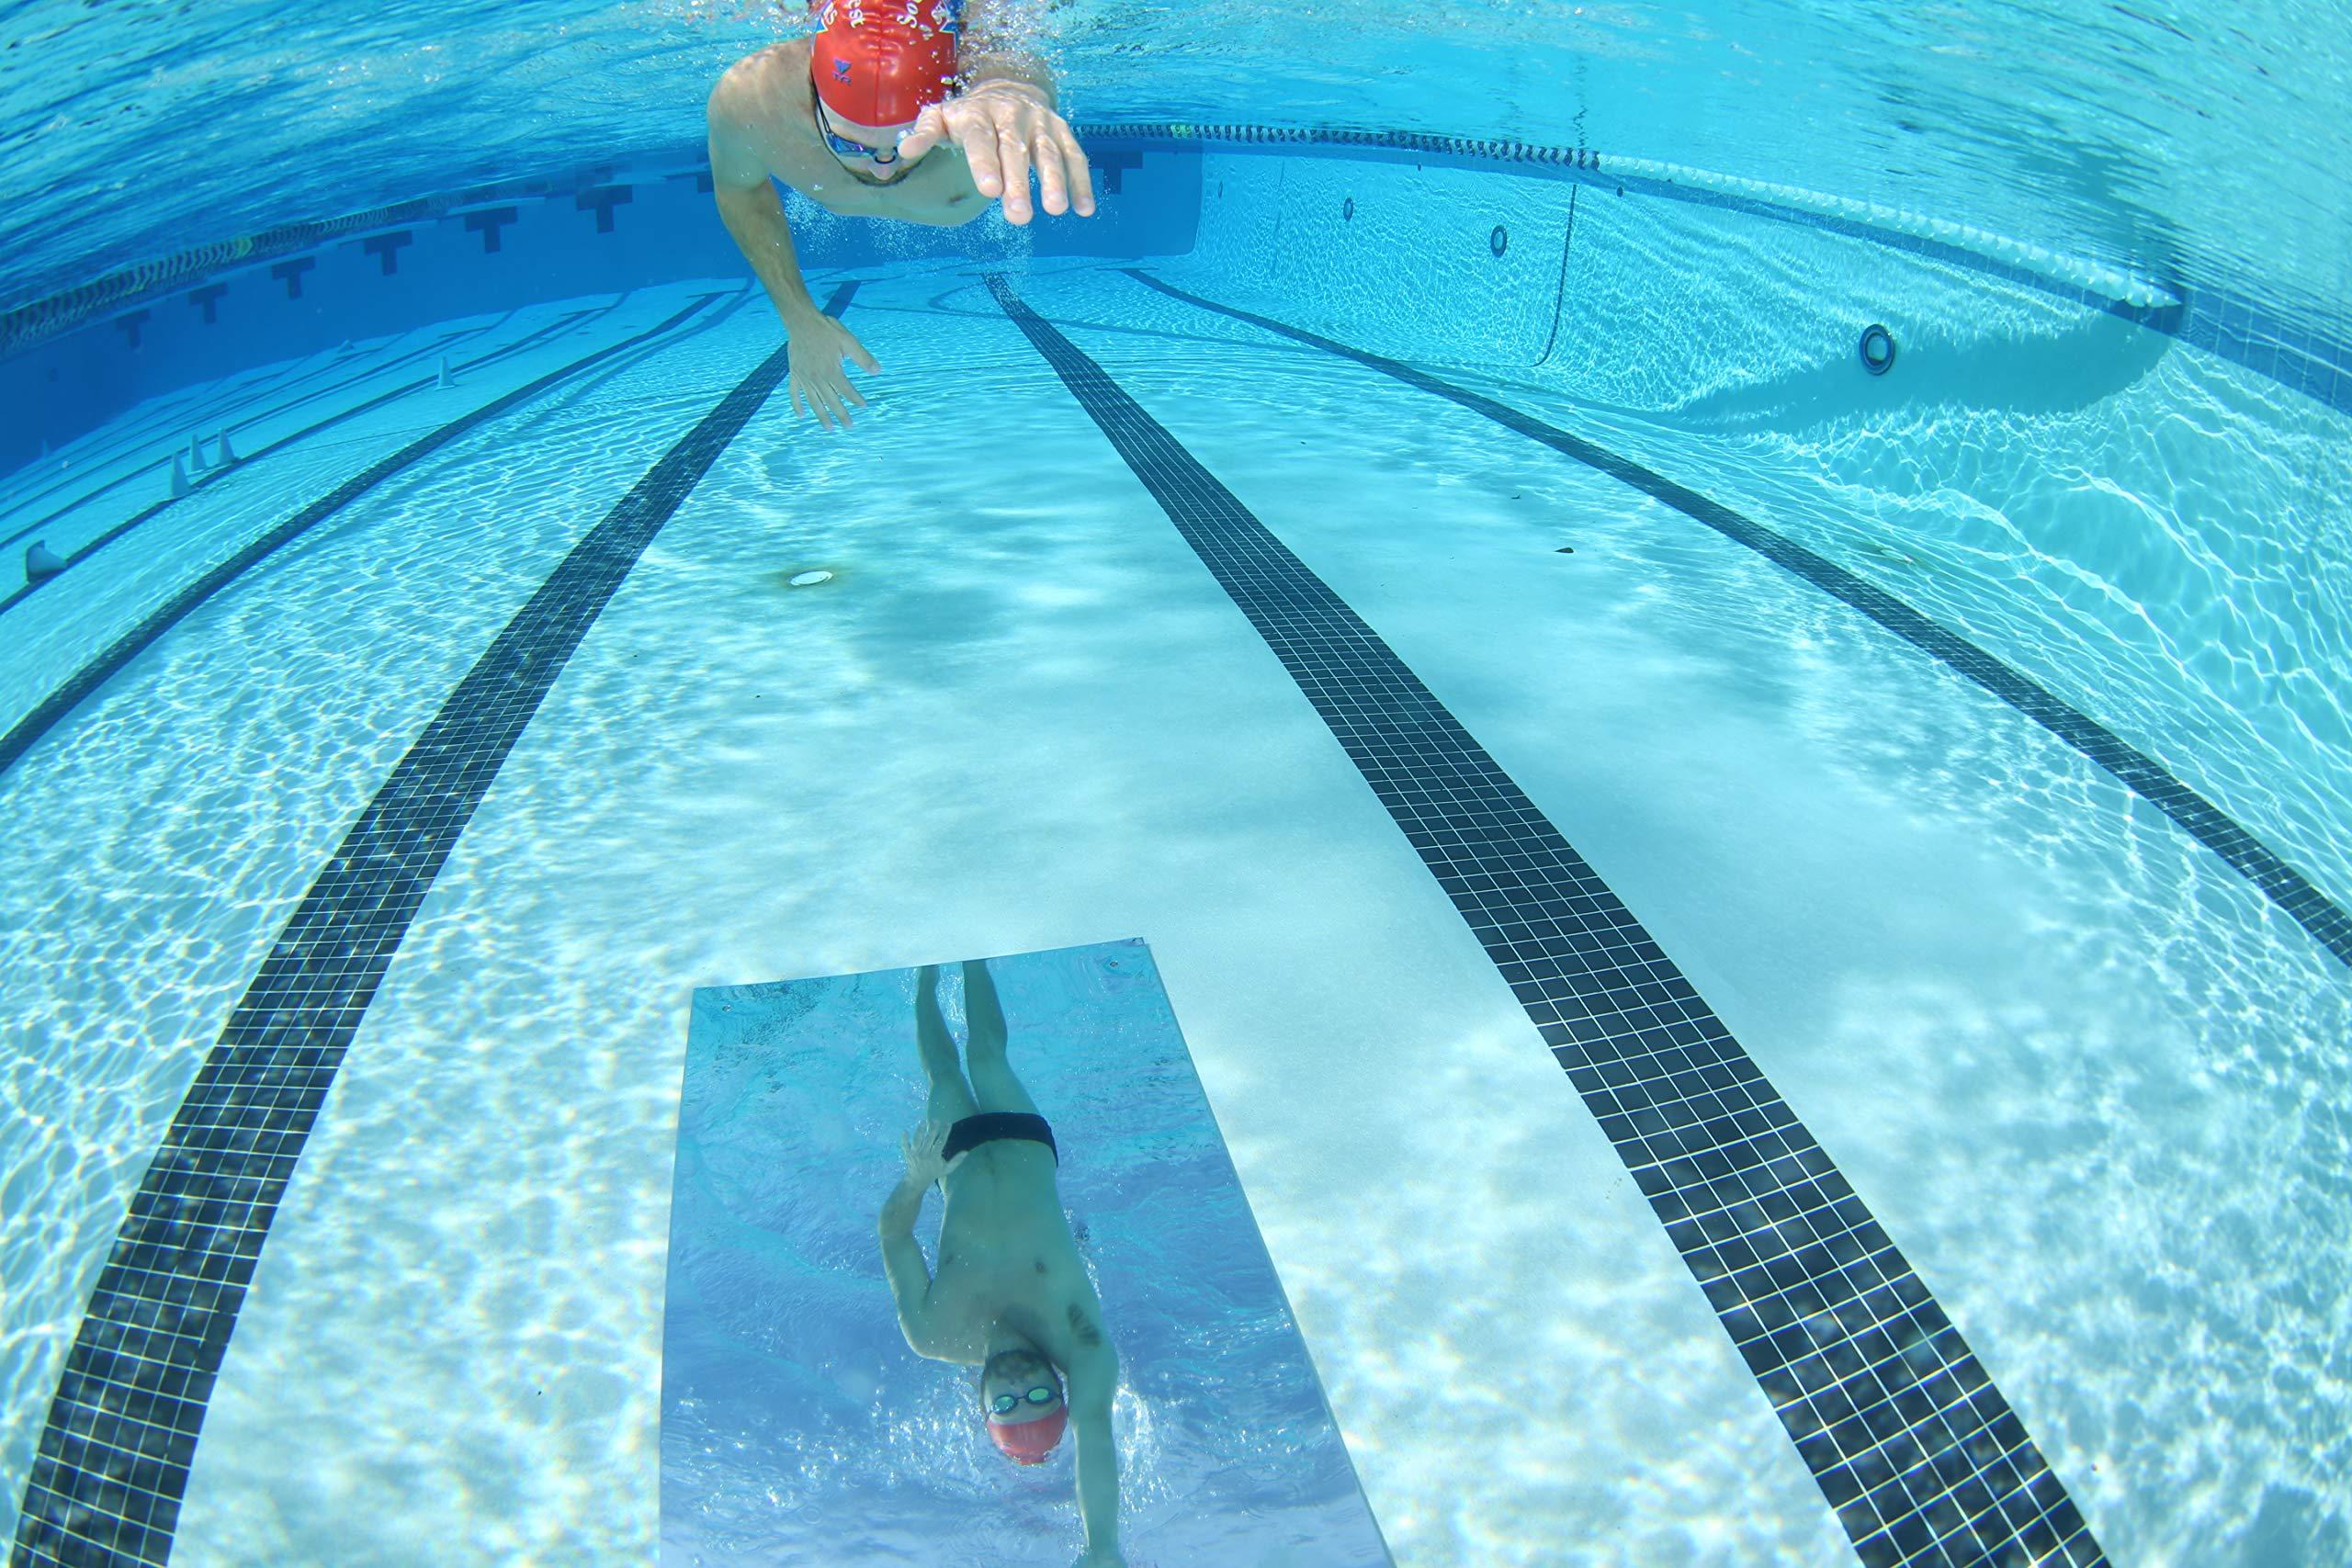 SwimMirror - The Ultimate Underwater Swim Training Pool Mirror Endorsed by Rowdy Gaines and Amanda Beard